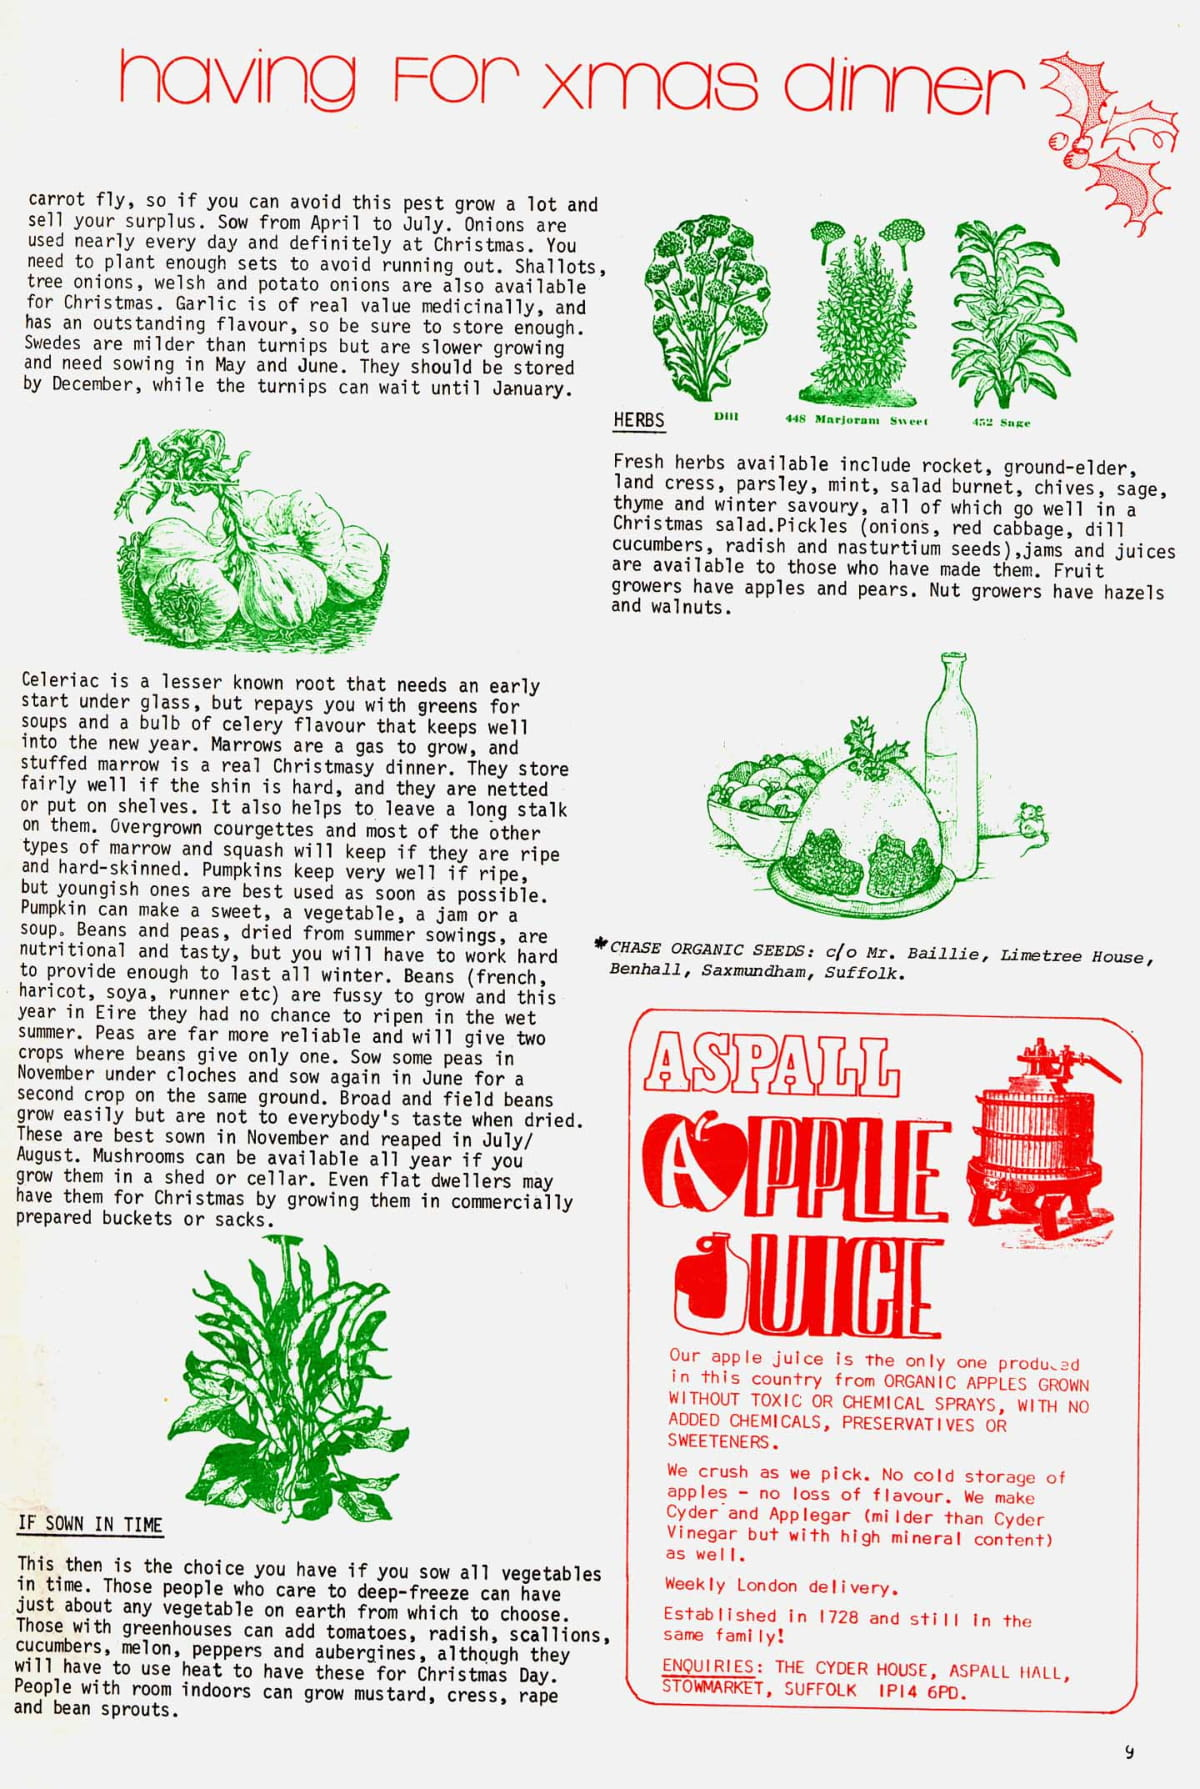 seed-v3-n11-nov1974-09.jpg